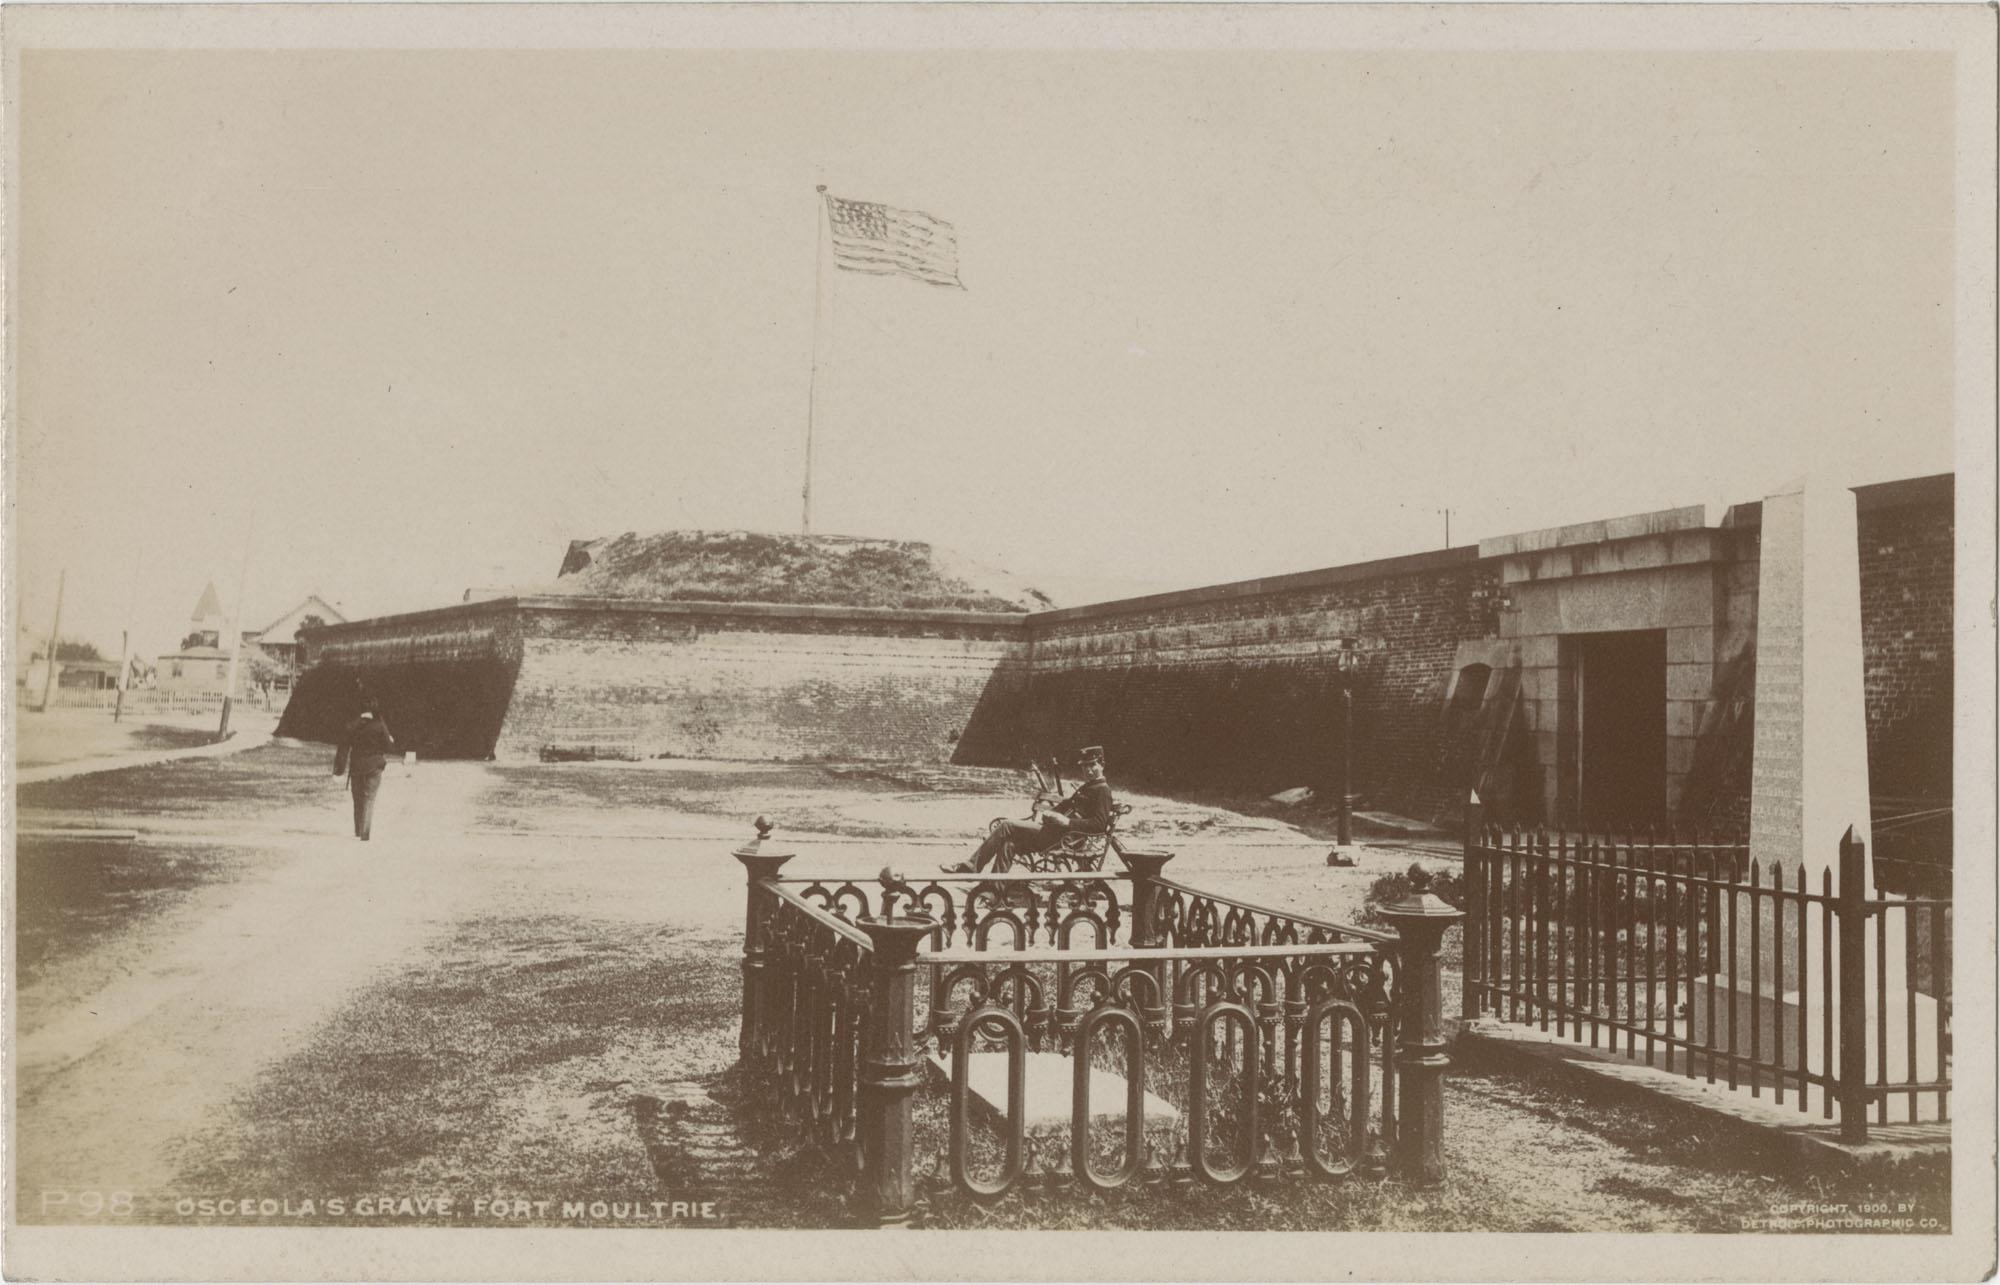 Osceola's Grave, Fort Moultrie